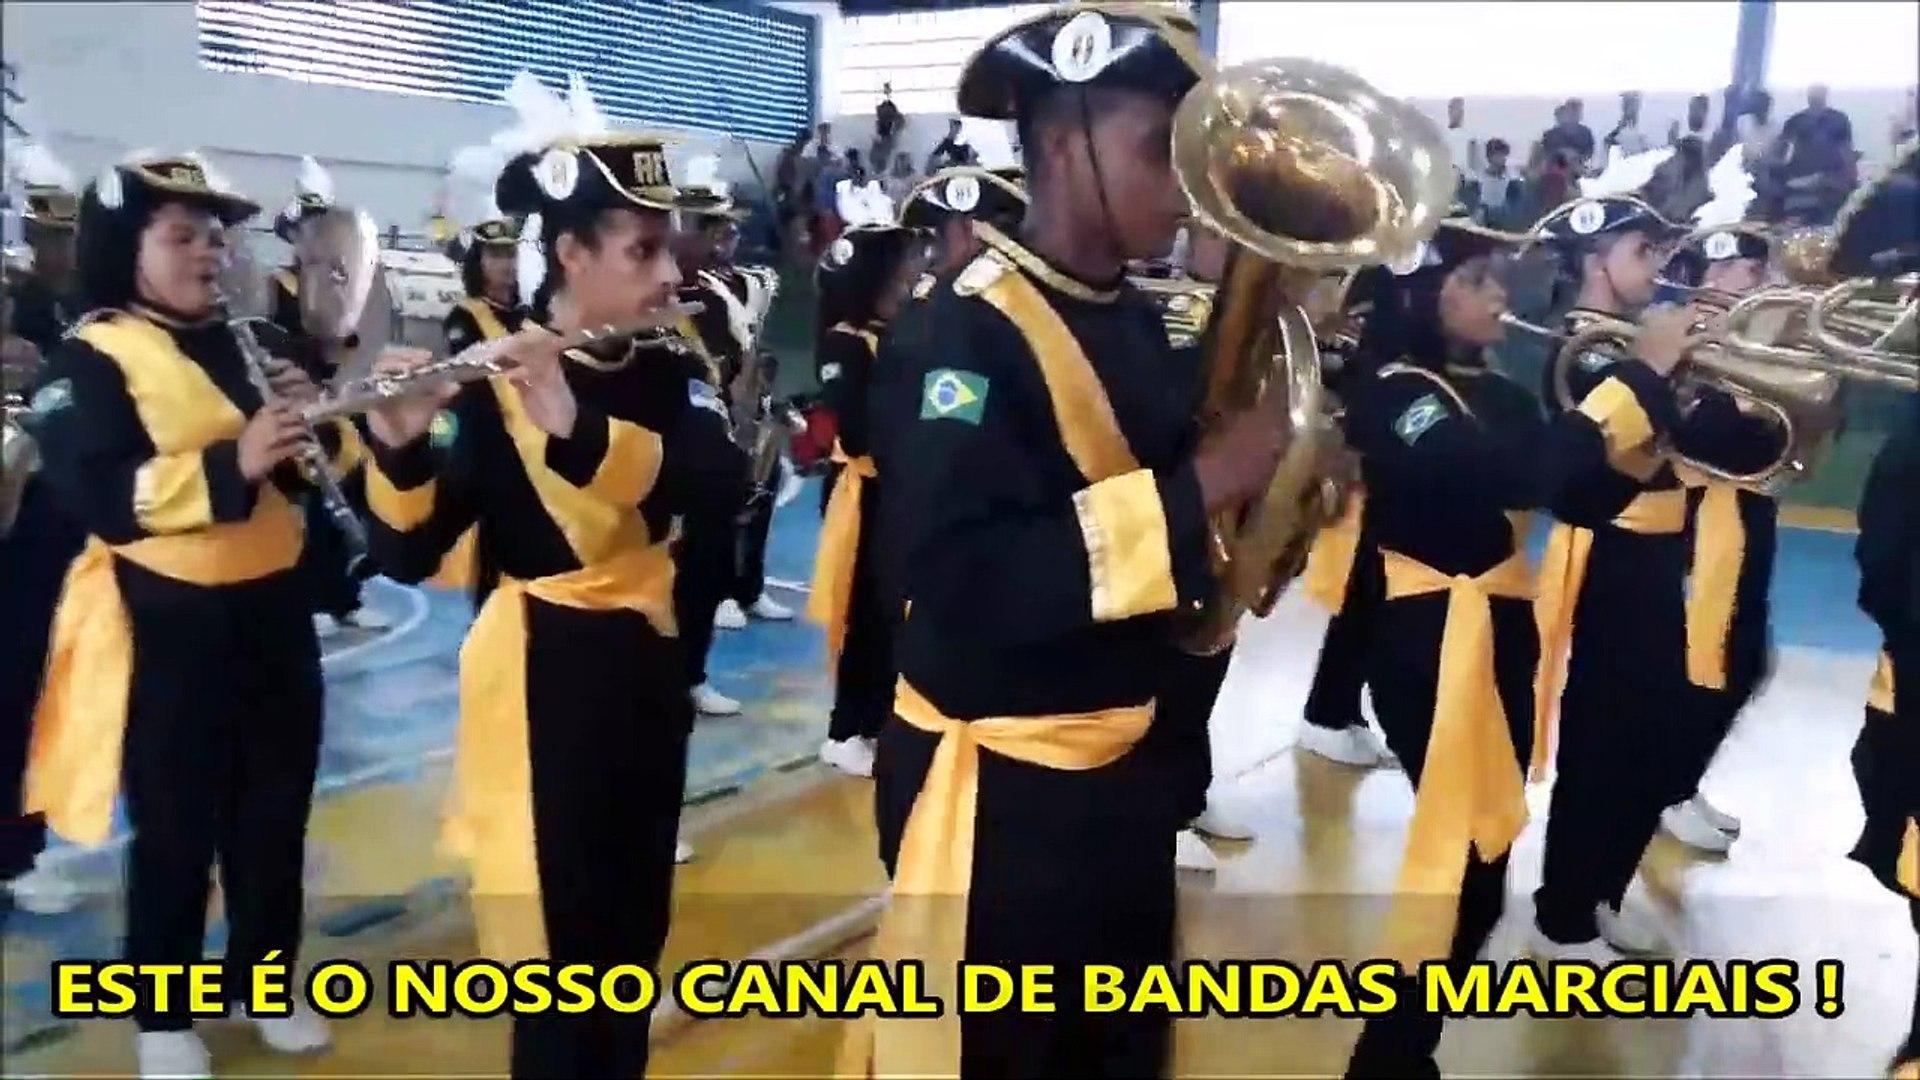 BANDA MUSICAL ALZIRA DA FONSECA 2018 - VI COPA NACIONAL DE CAMPEÃS DE BANDAS E FANFARRAS